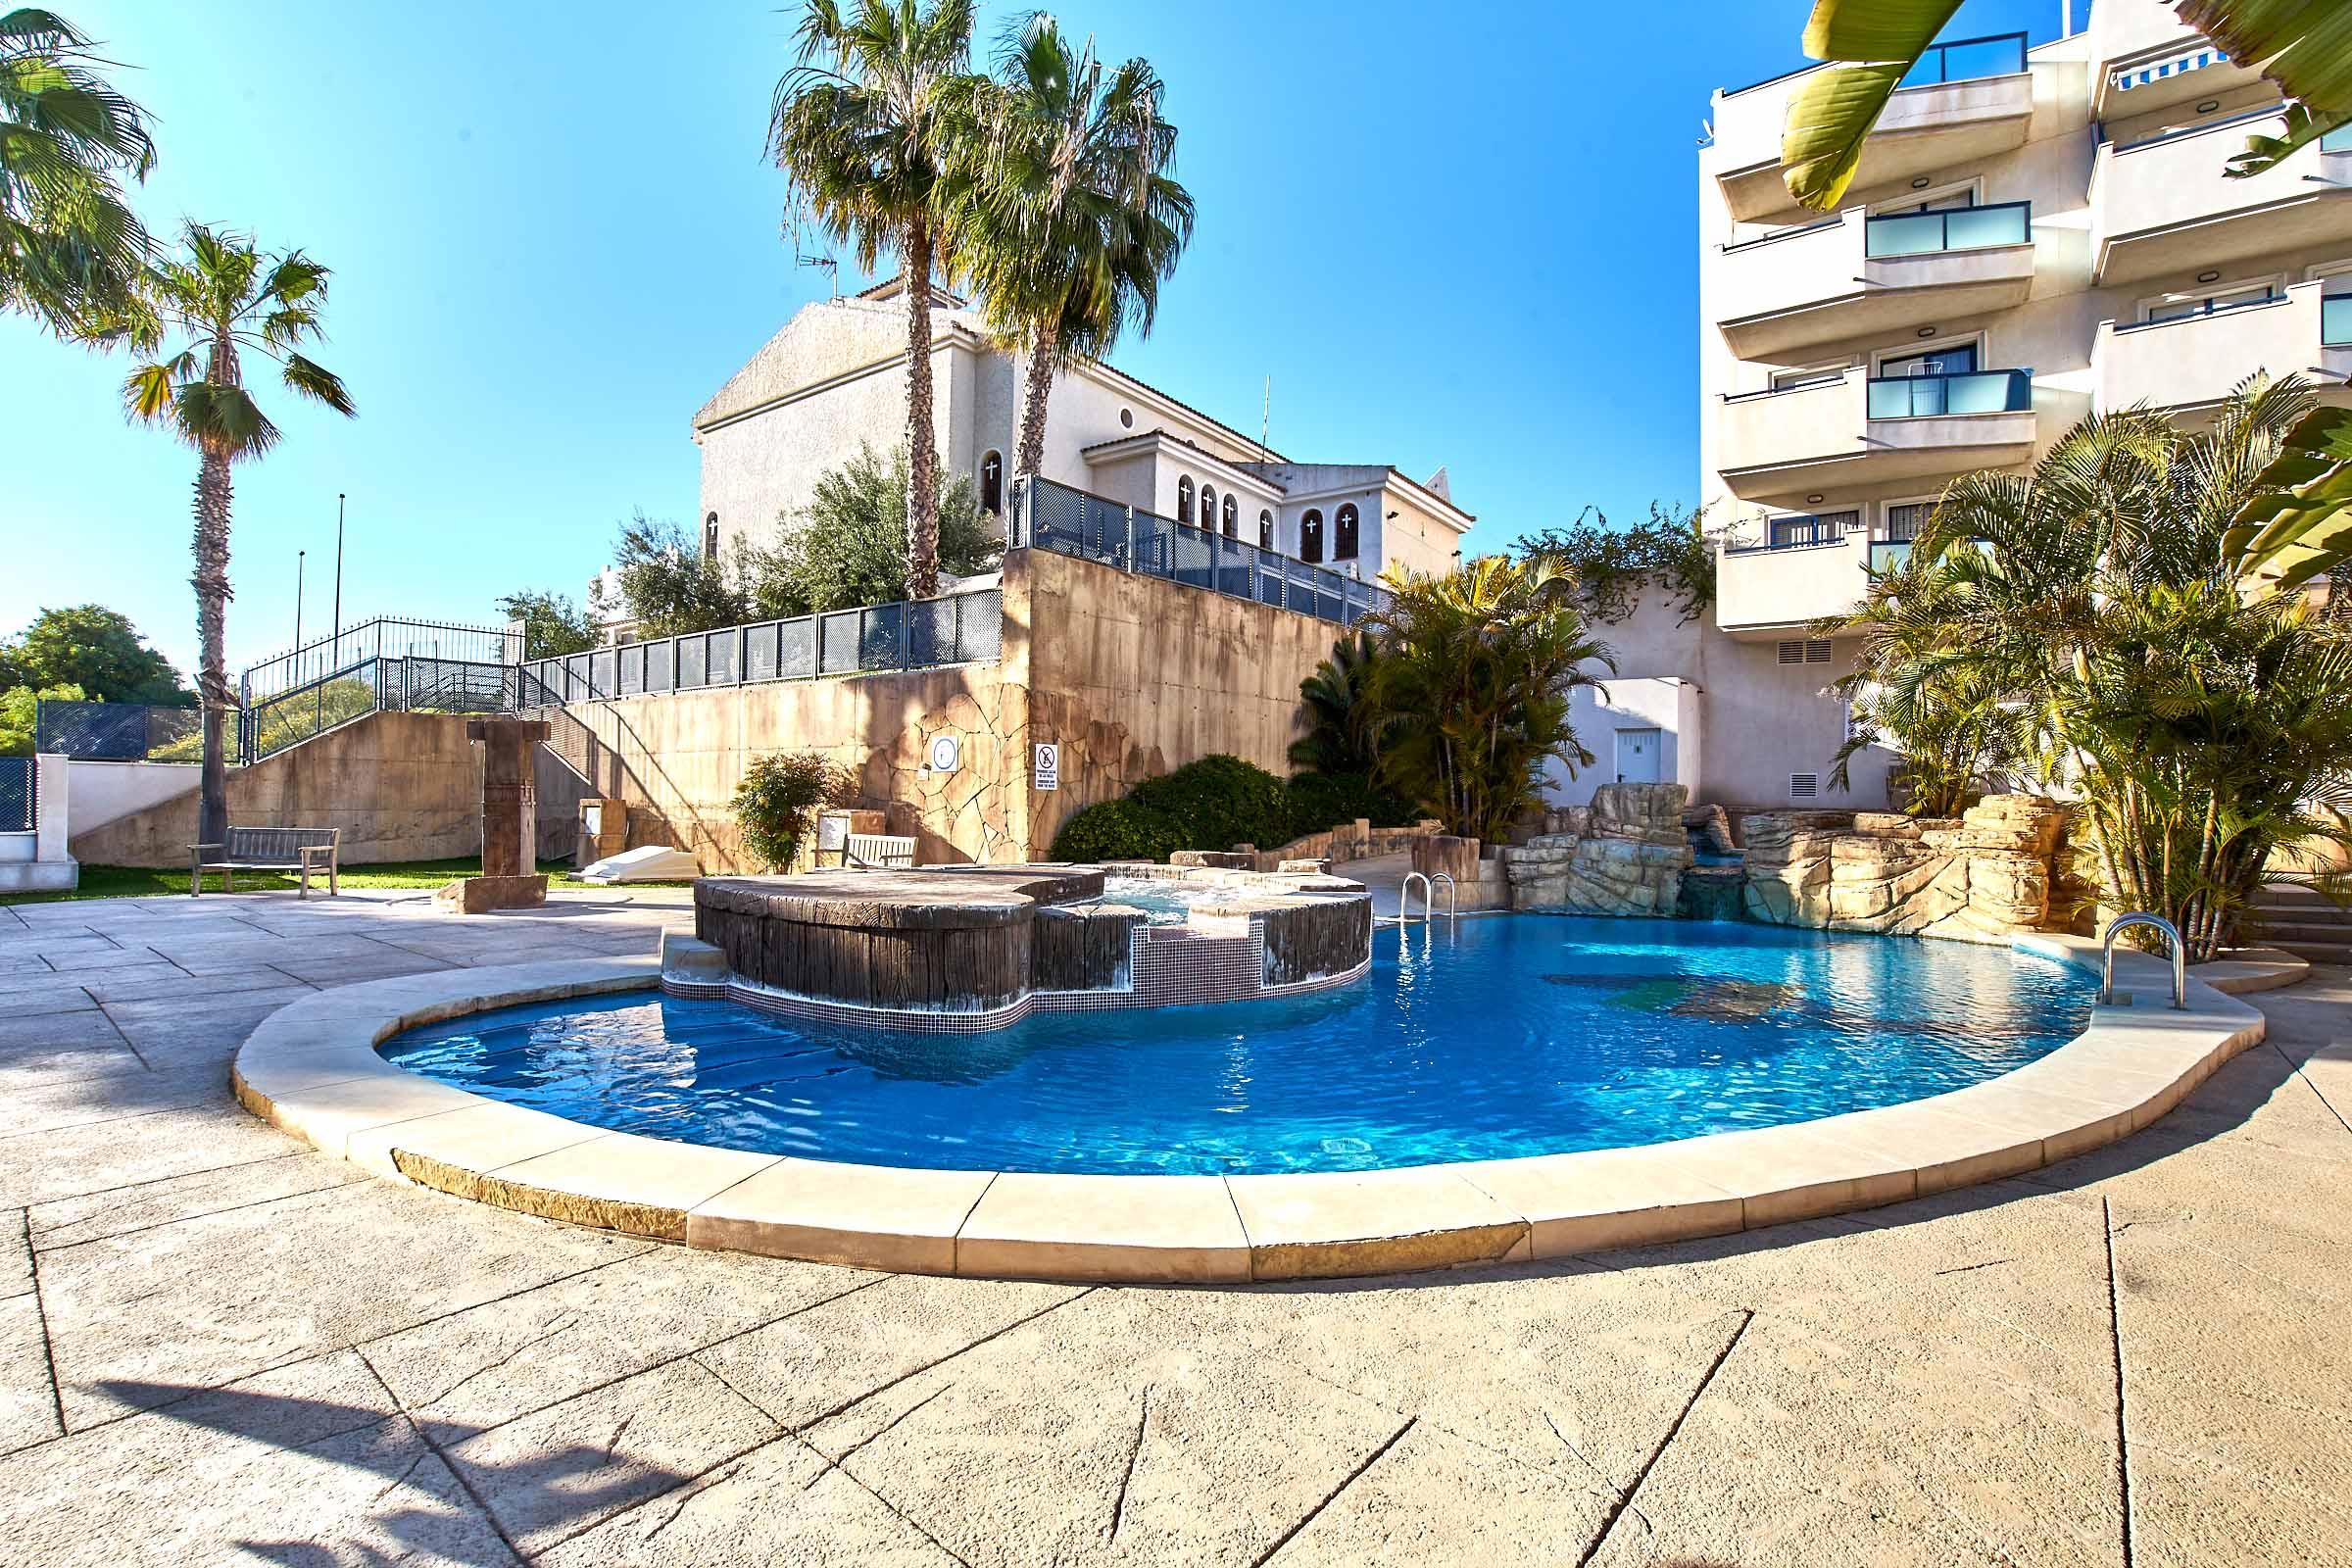 Apartment Espanhouse La Zenia 109 photo 20450301